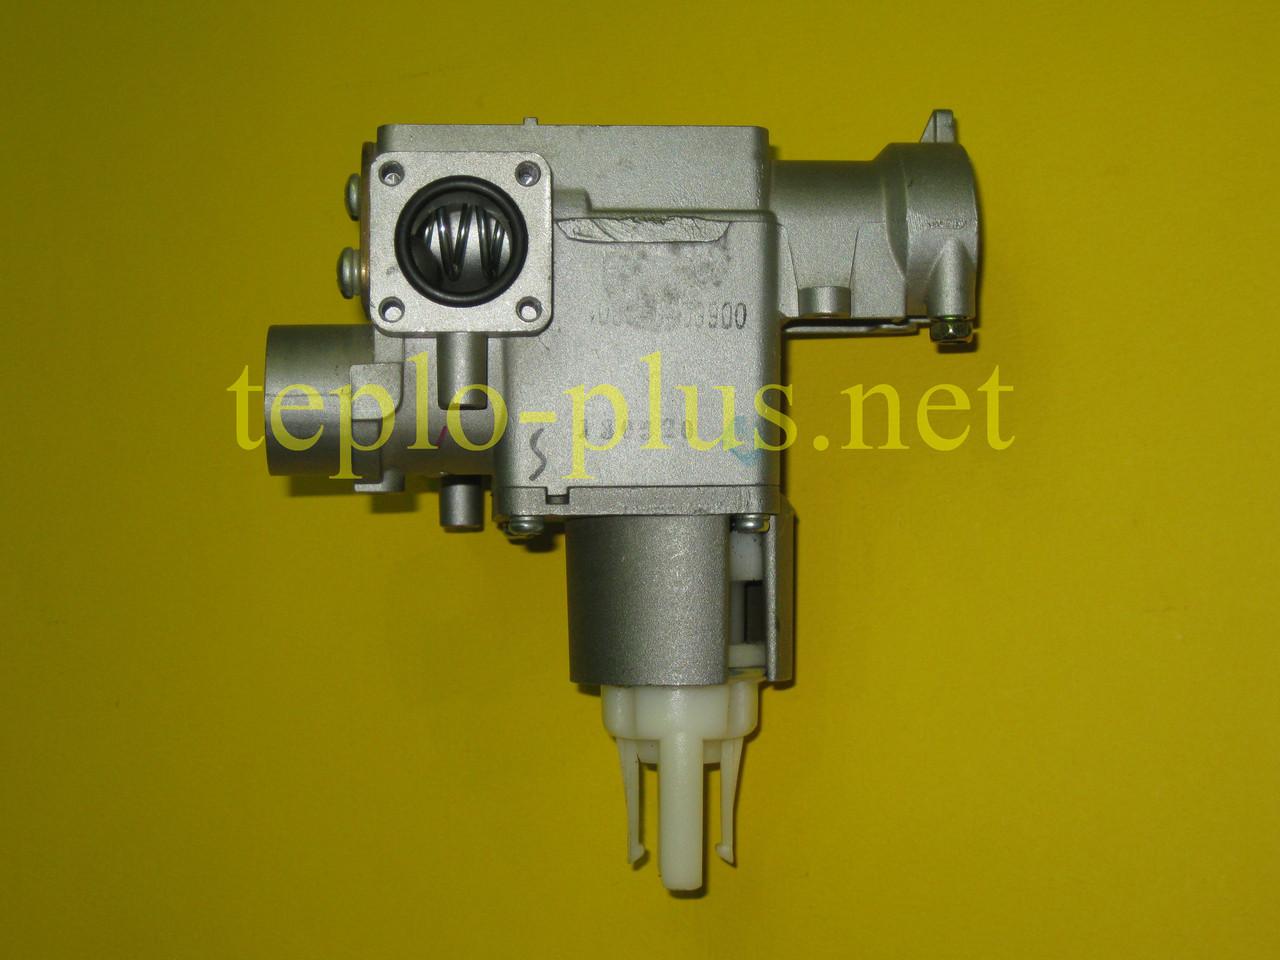 Газовый клапан 61313909 Ariston Fast 11, 14, 16 CF P, Chaffoteaux Fluendo 11, 14 CF P